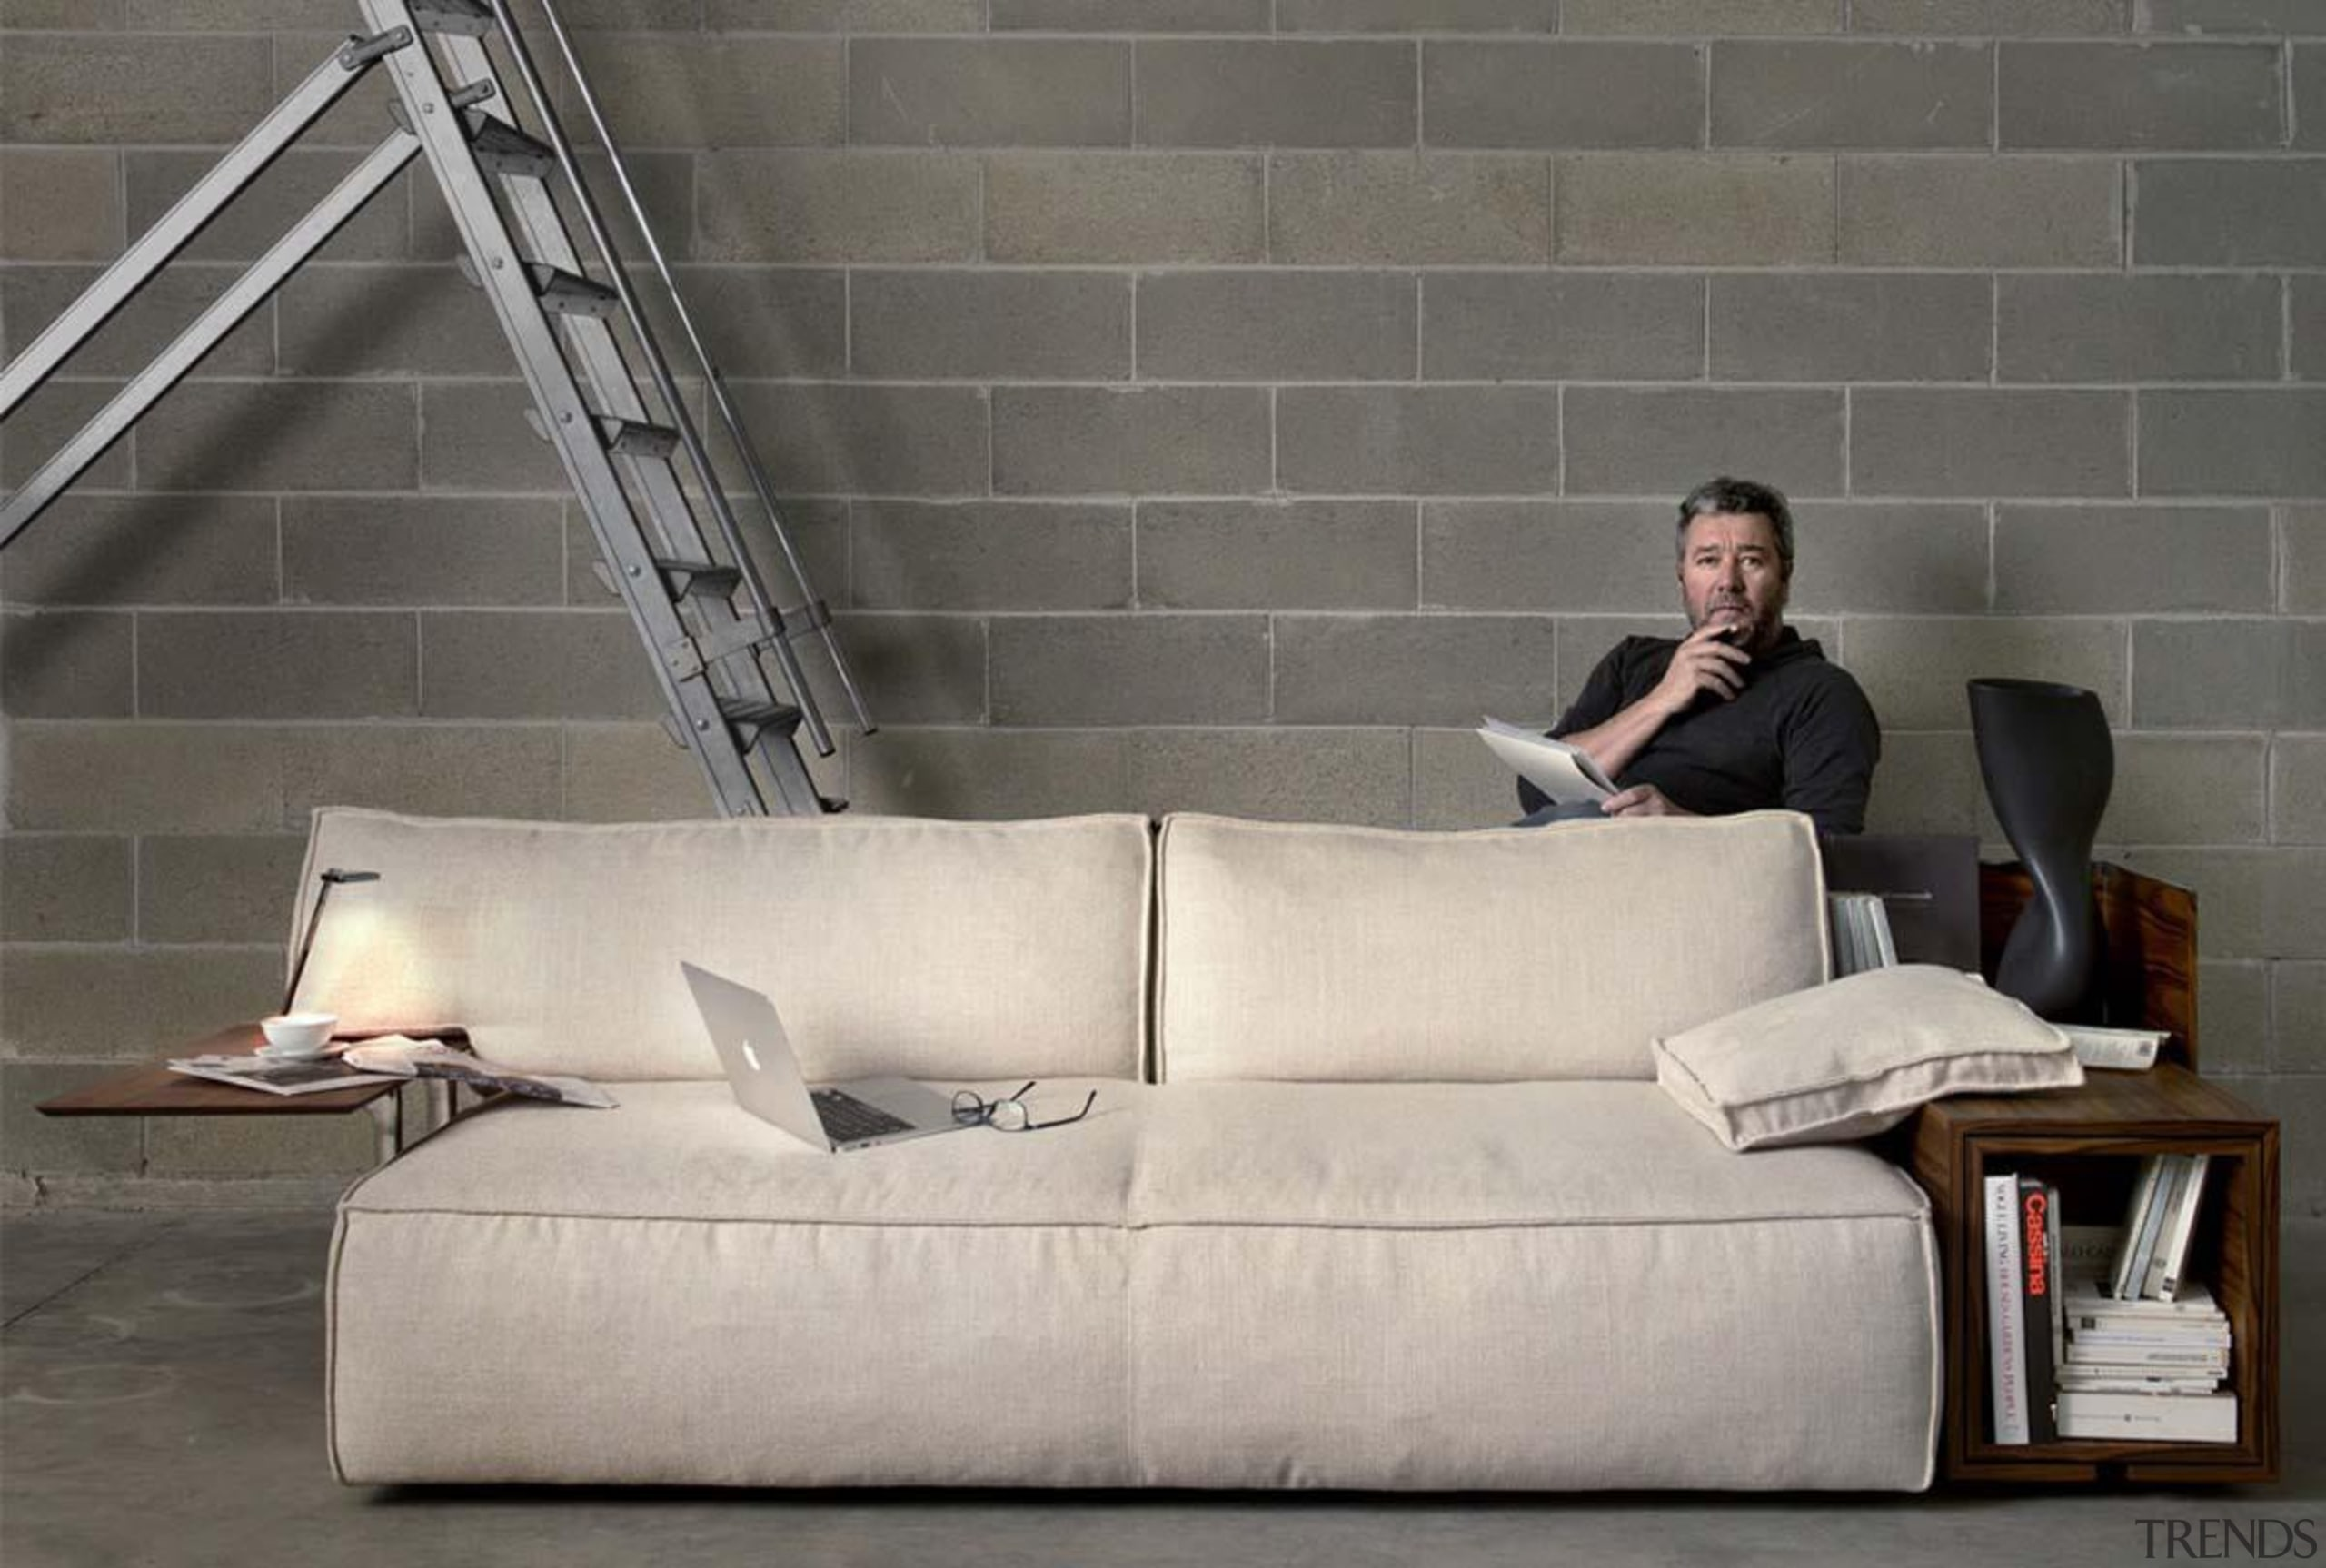 cassinastarckmyworldsofainstu.jpg - cassinastarckmyworldsofainstu.jpg - angle | bed | angle, bed, chair, chaise longue, couch, floor, flooring, furniture, interior design, lighting, product design, sofa bed, wall, gray